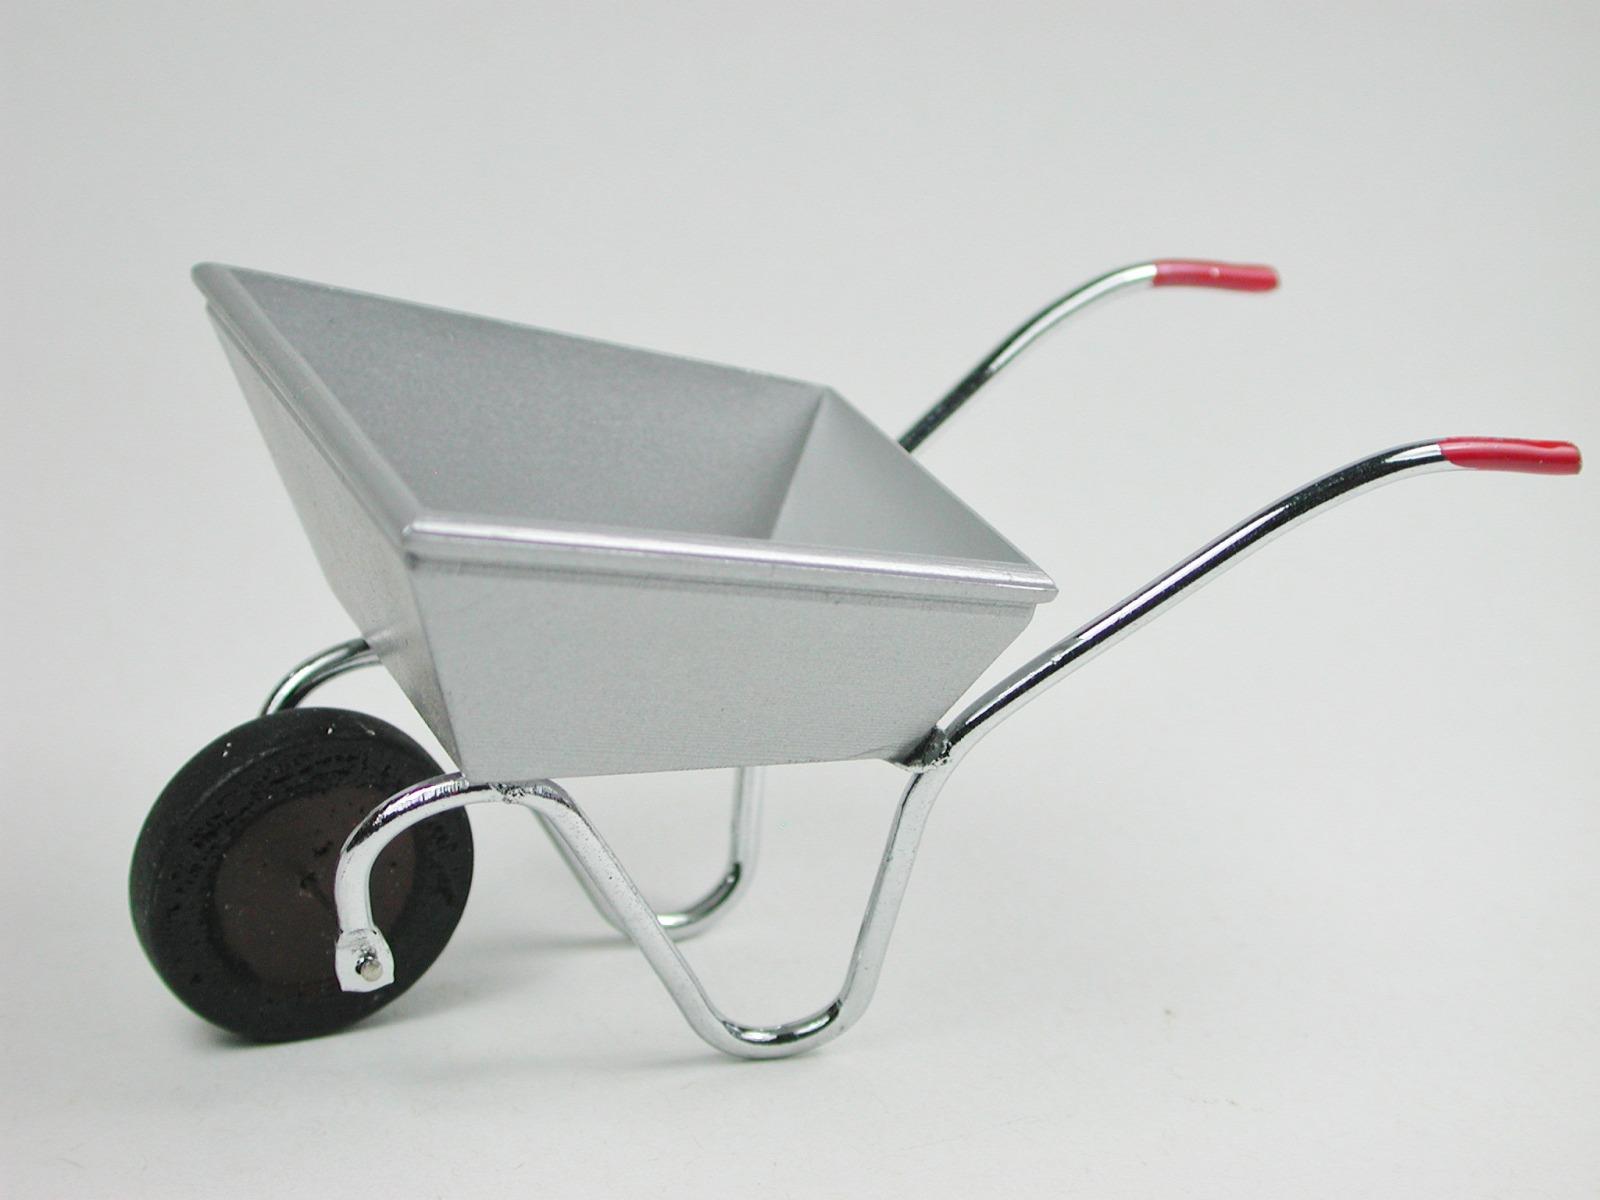 Schubkarre aus Metall 2